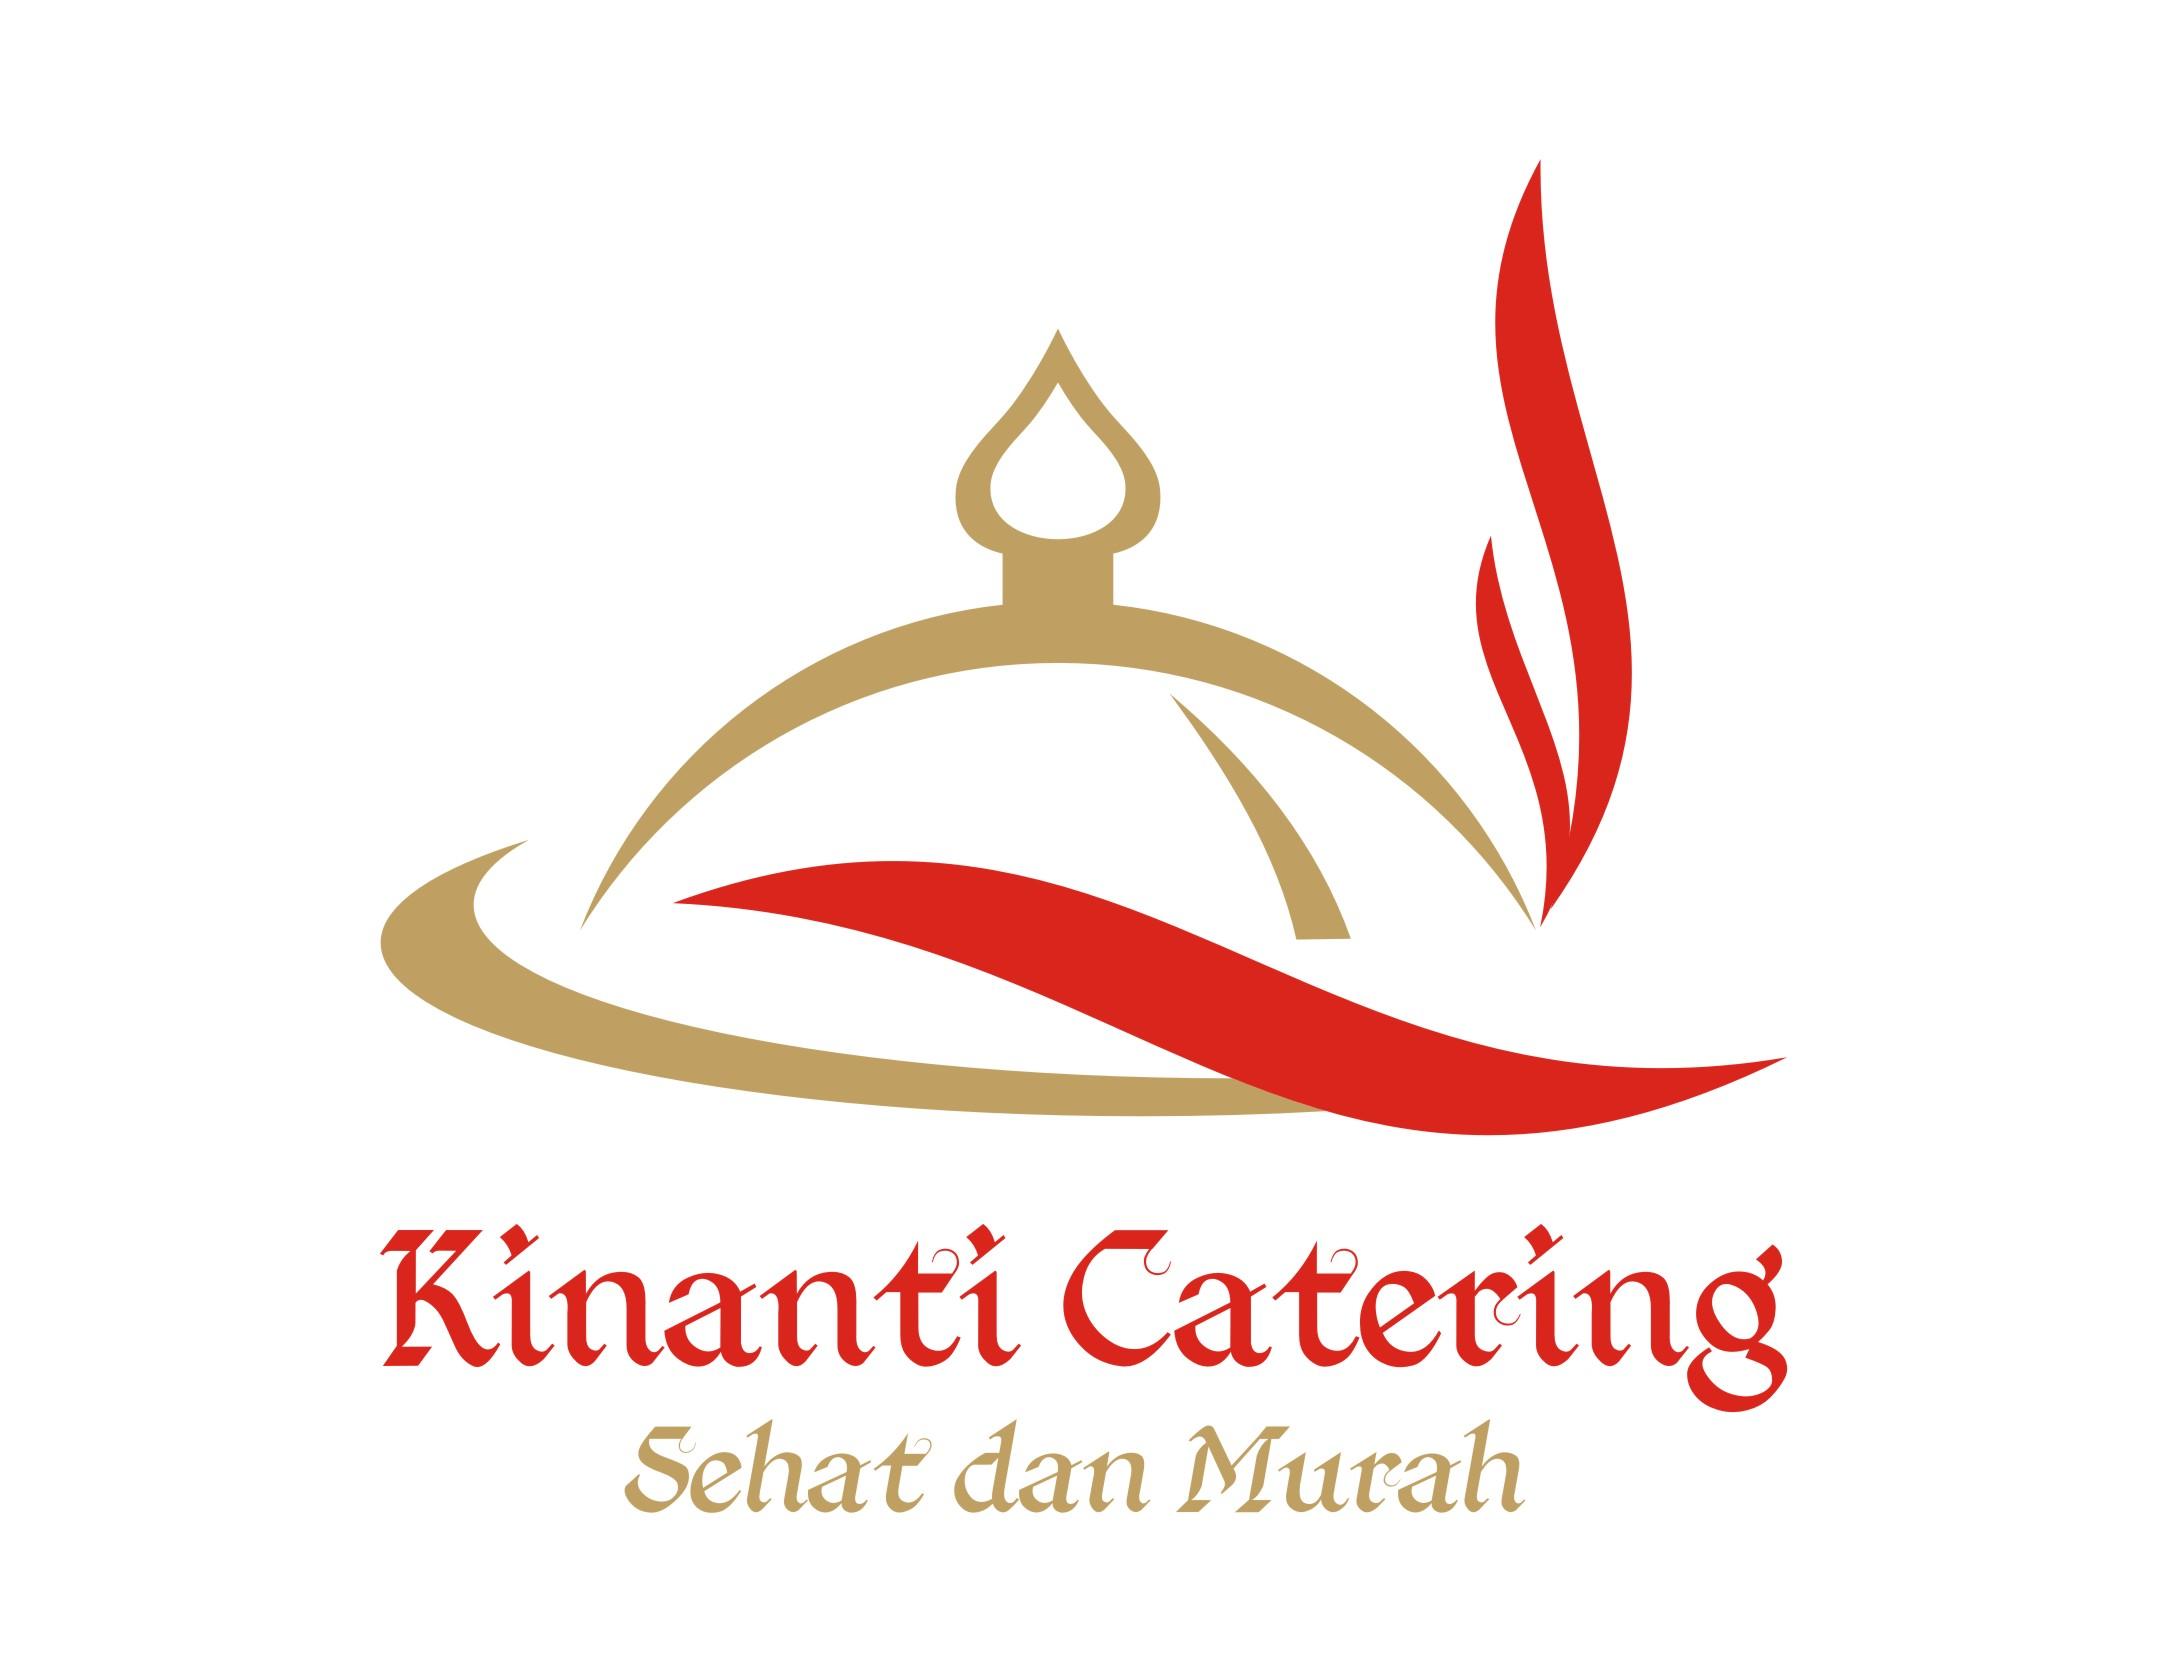 catering di jakarta newhairstylesformen2014com